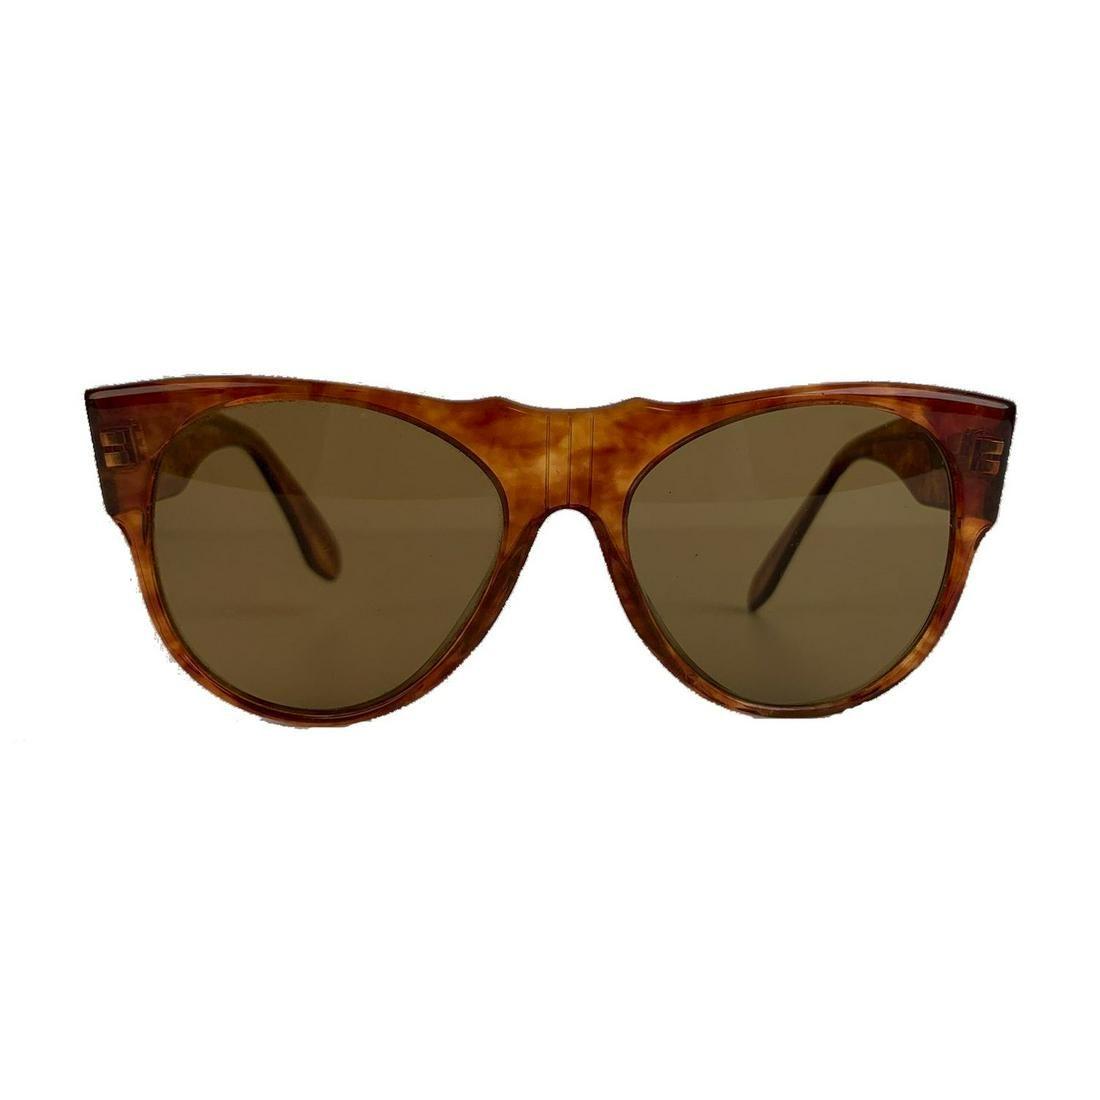 Persol Ratti Vintage Rare Mint Brown Sunglasses Mod.